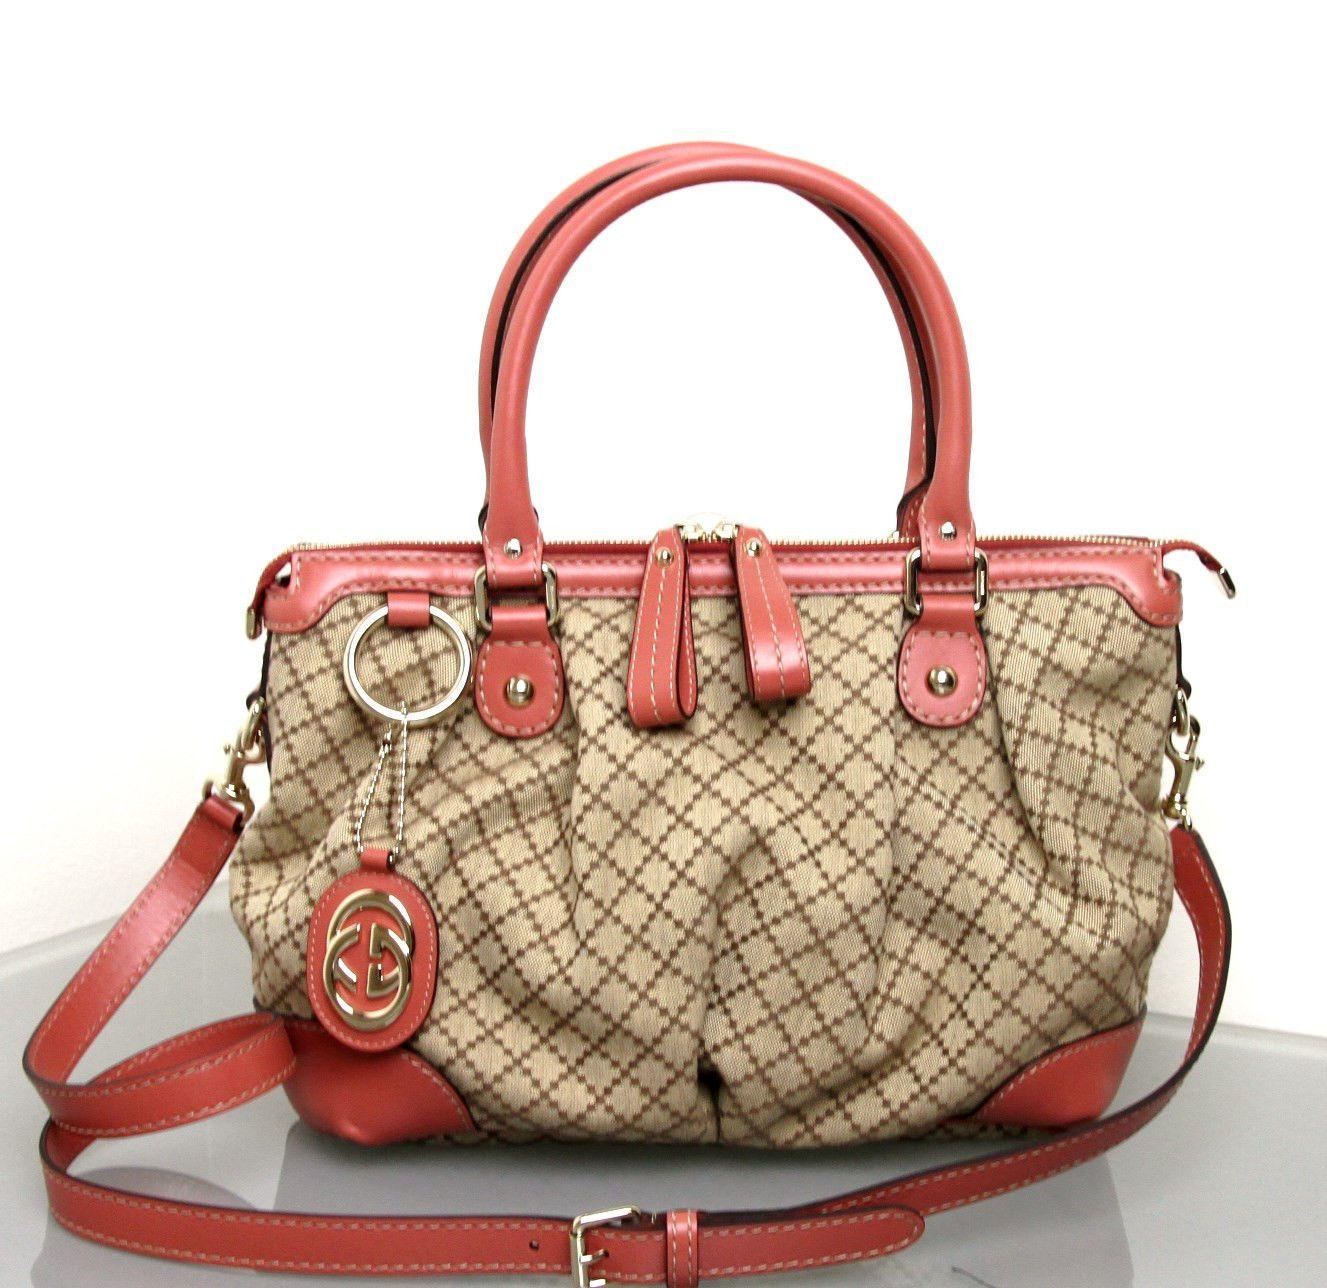 e95f00c8d34ff5 NEW Authentic Gucci Sukey Diamante Canvas Tote Messenger Bag Handbag 247902